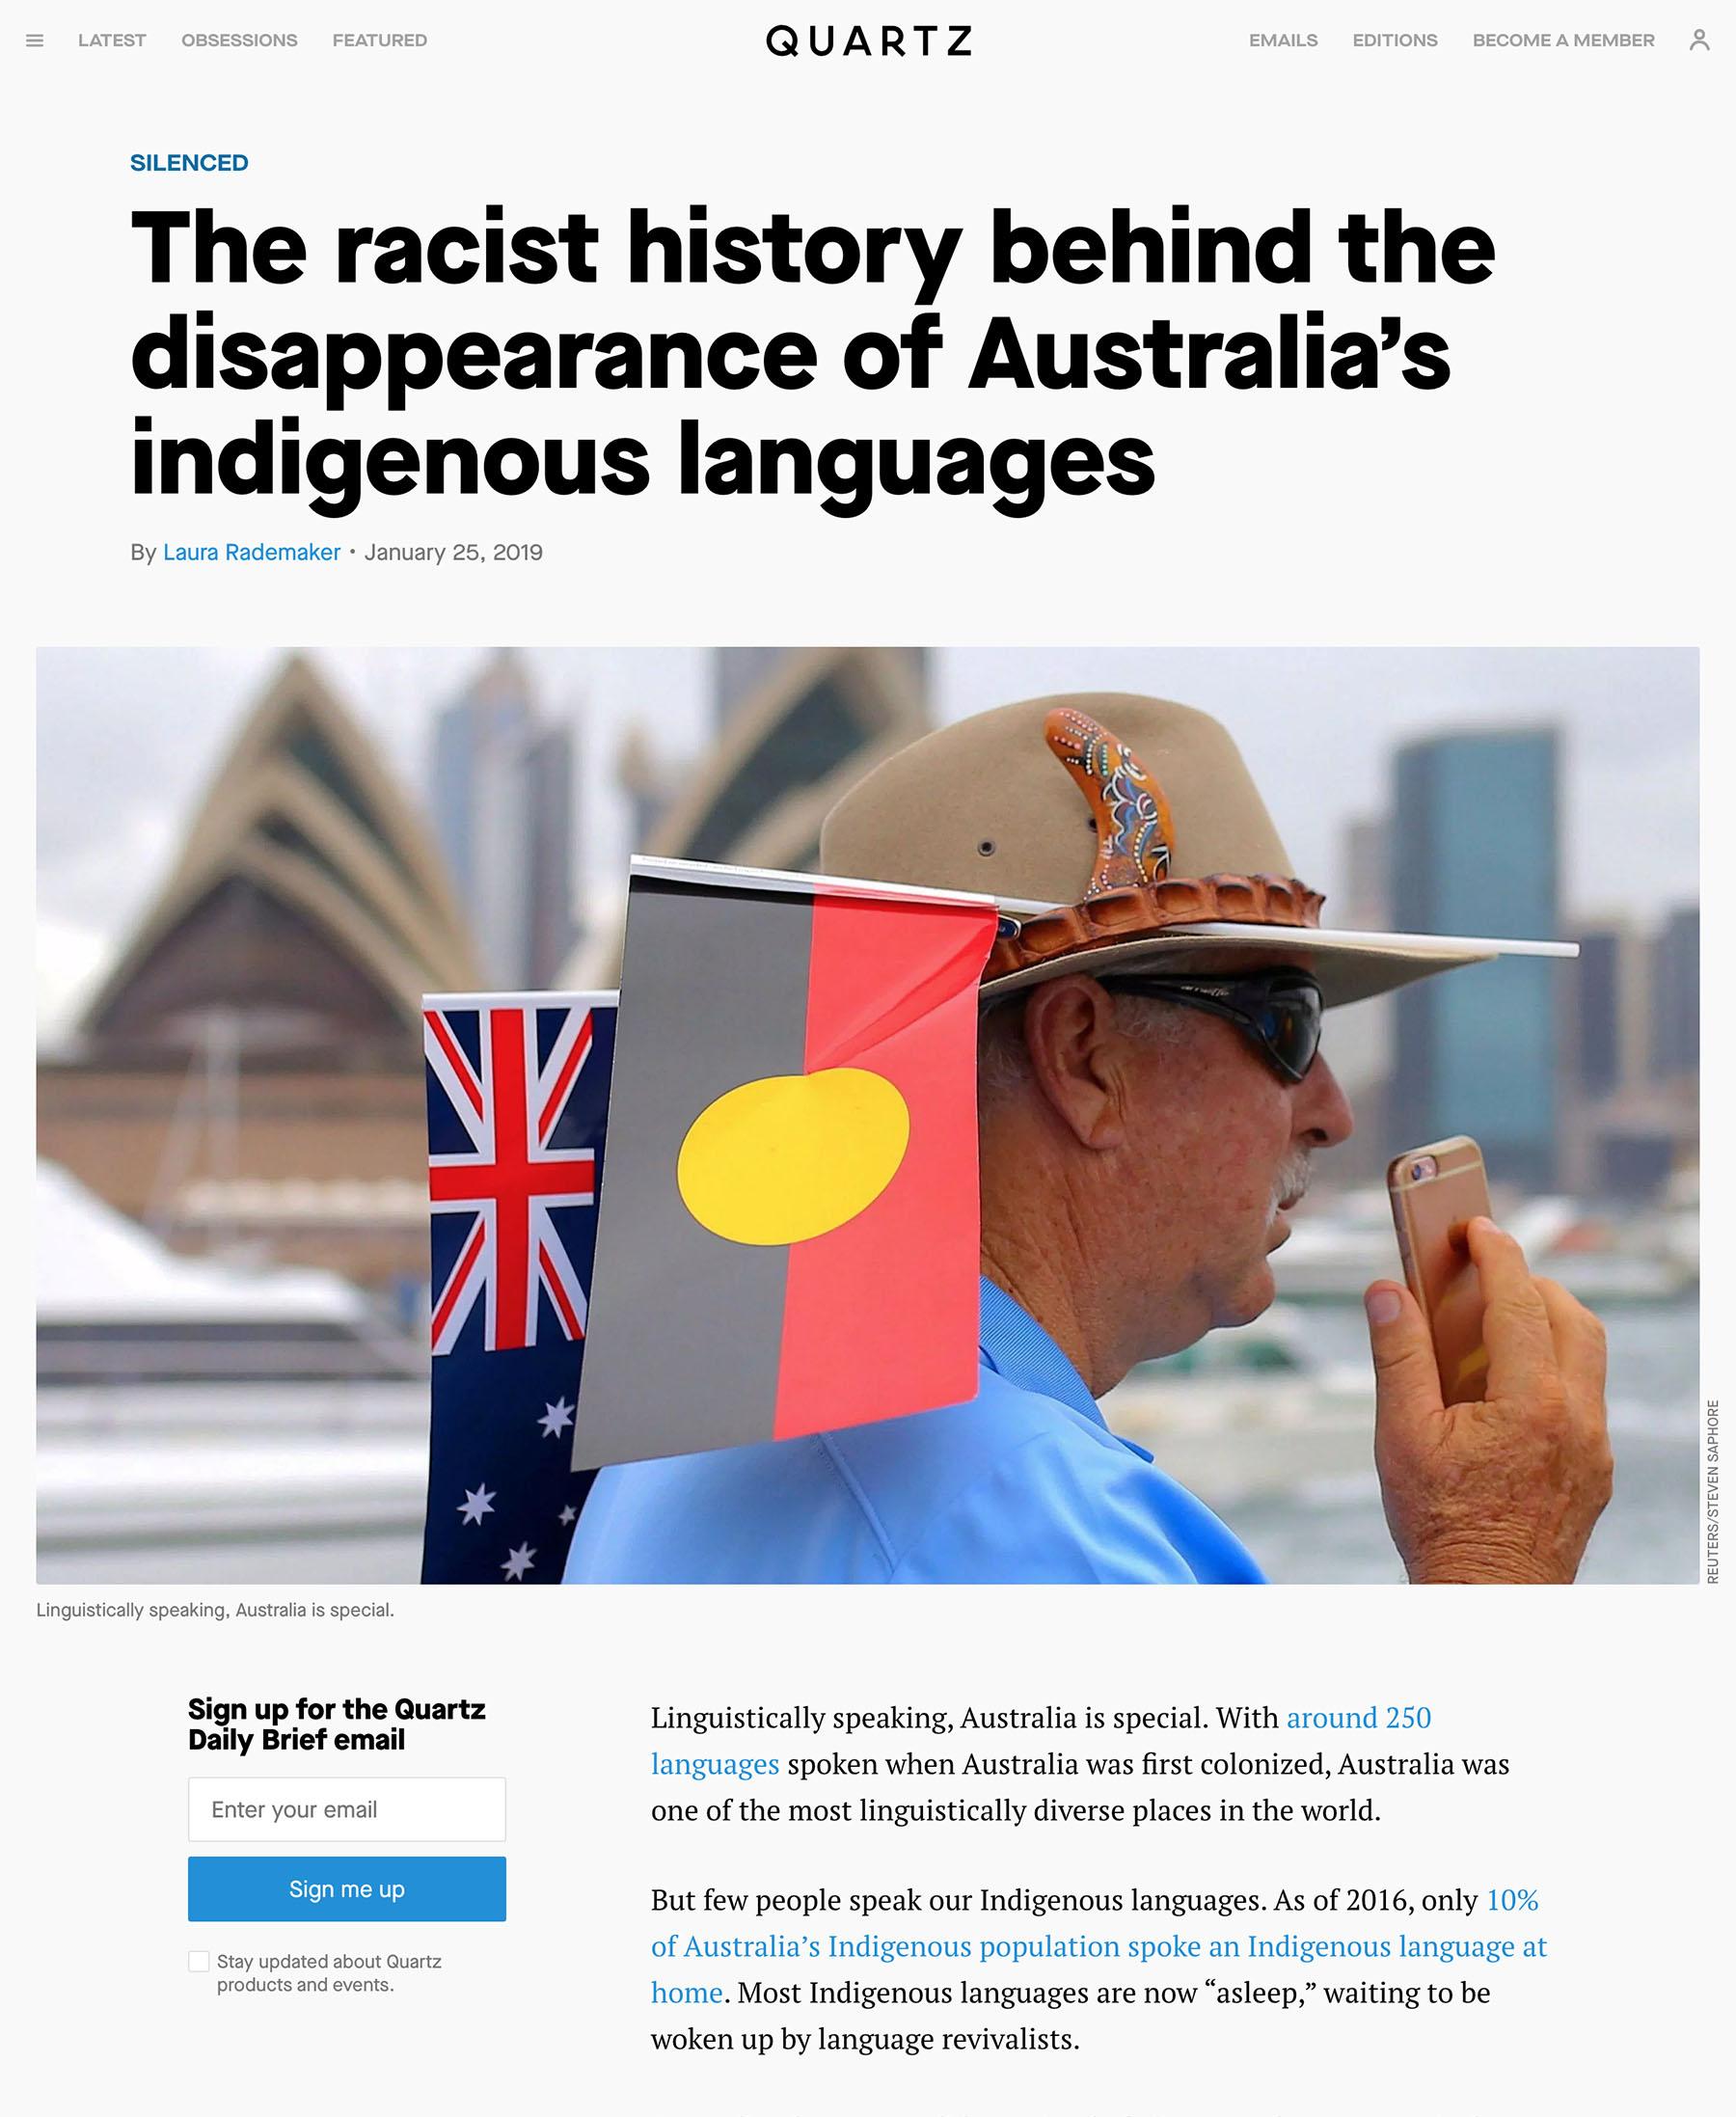 2019-01-25 qz.com Racist History Australias Indigenous Languages.jpg